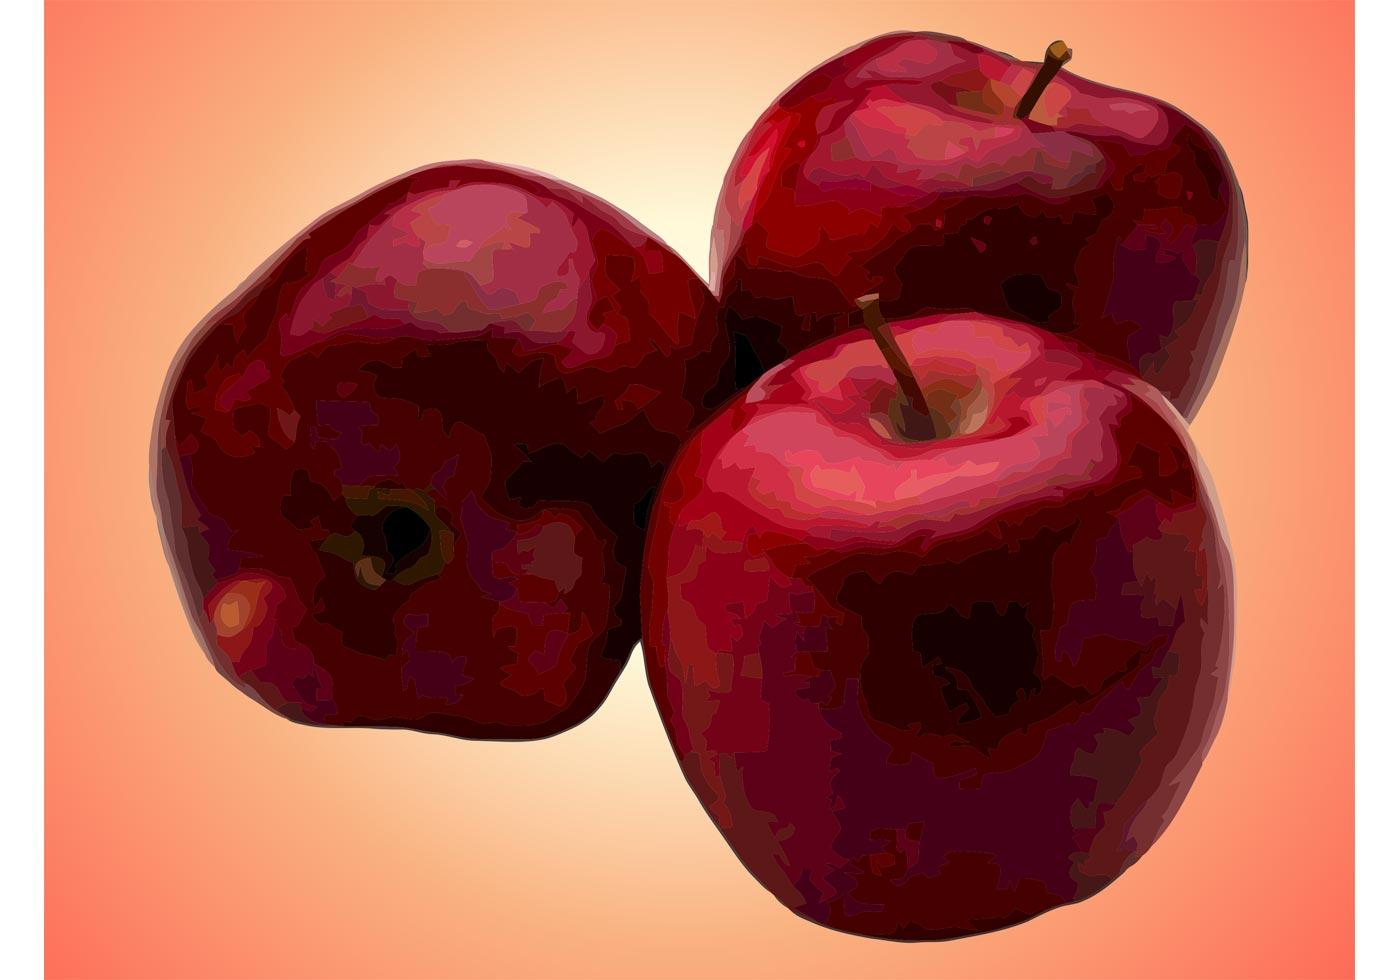 1400x980 Red Apple Free Vector Art